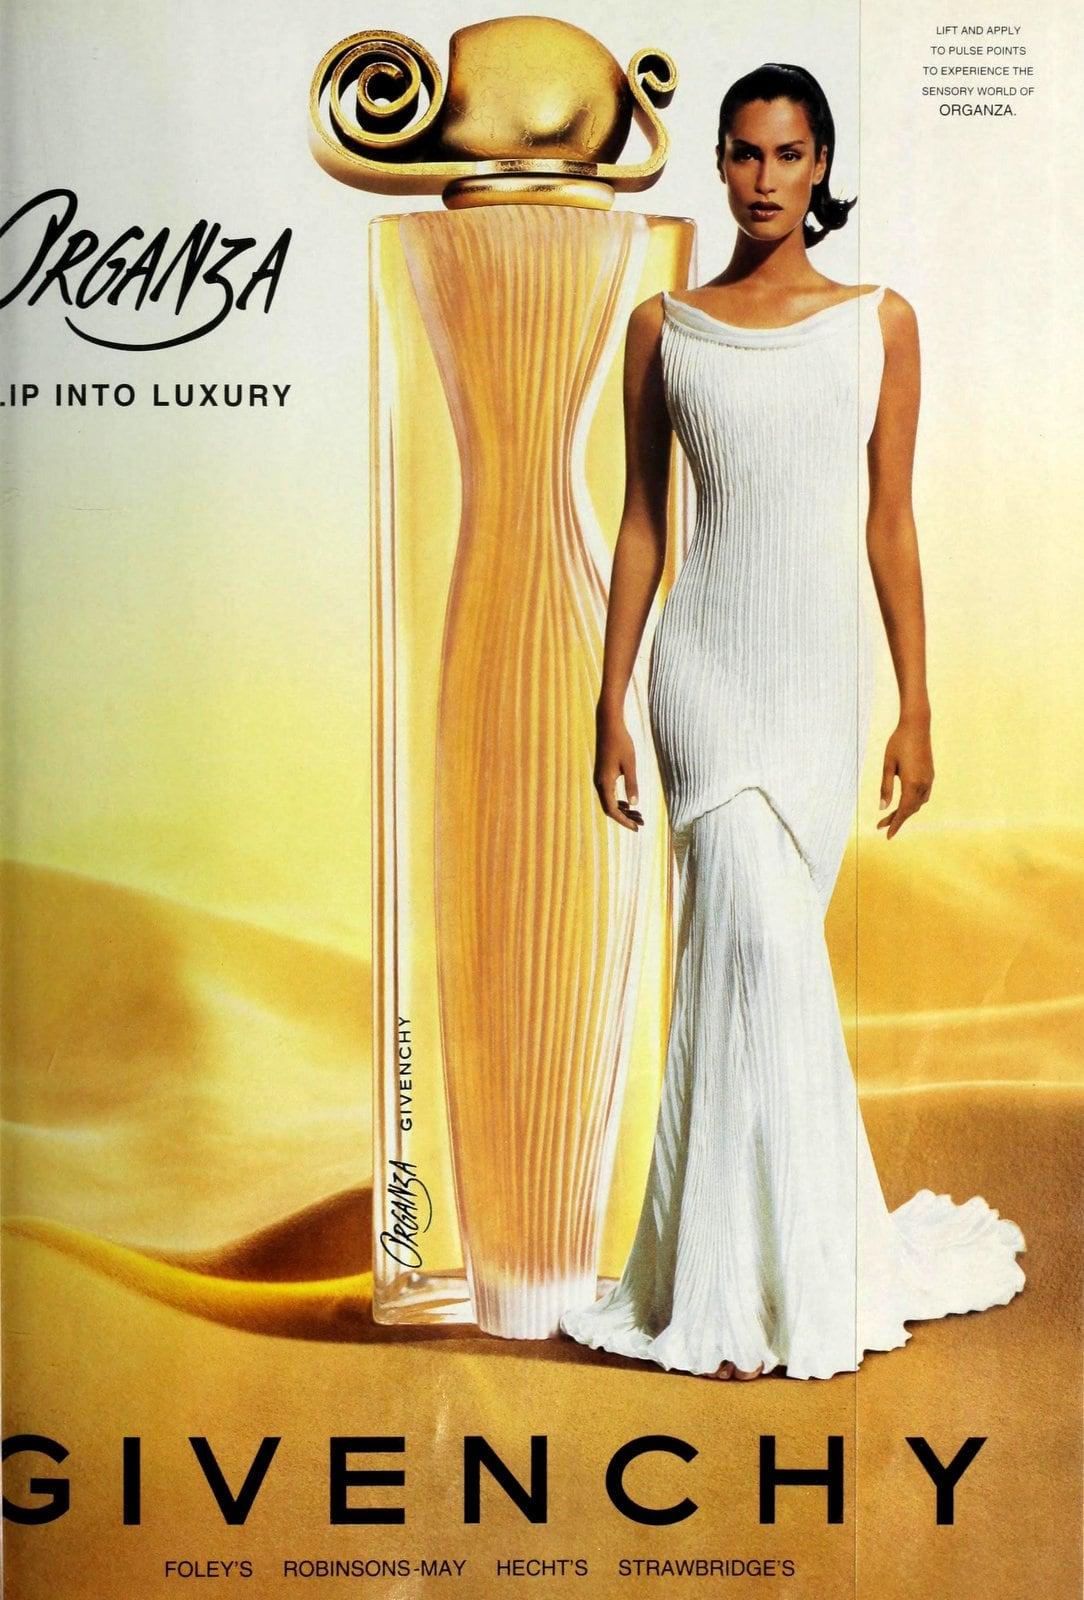 Popular vintage perfumes from the '90s - Organza from Givenchy (1998) at ClickAmericana.com